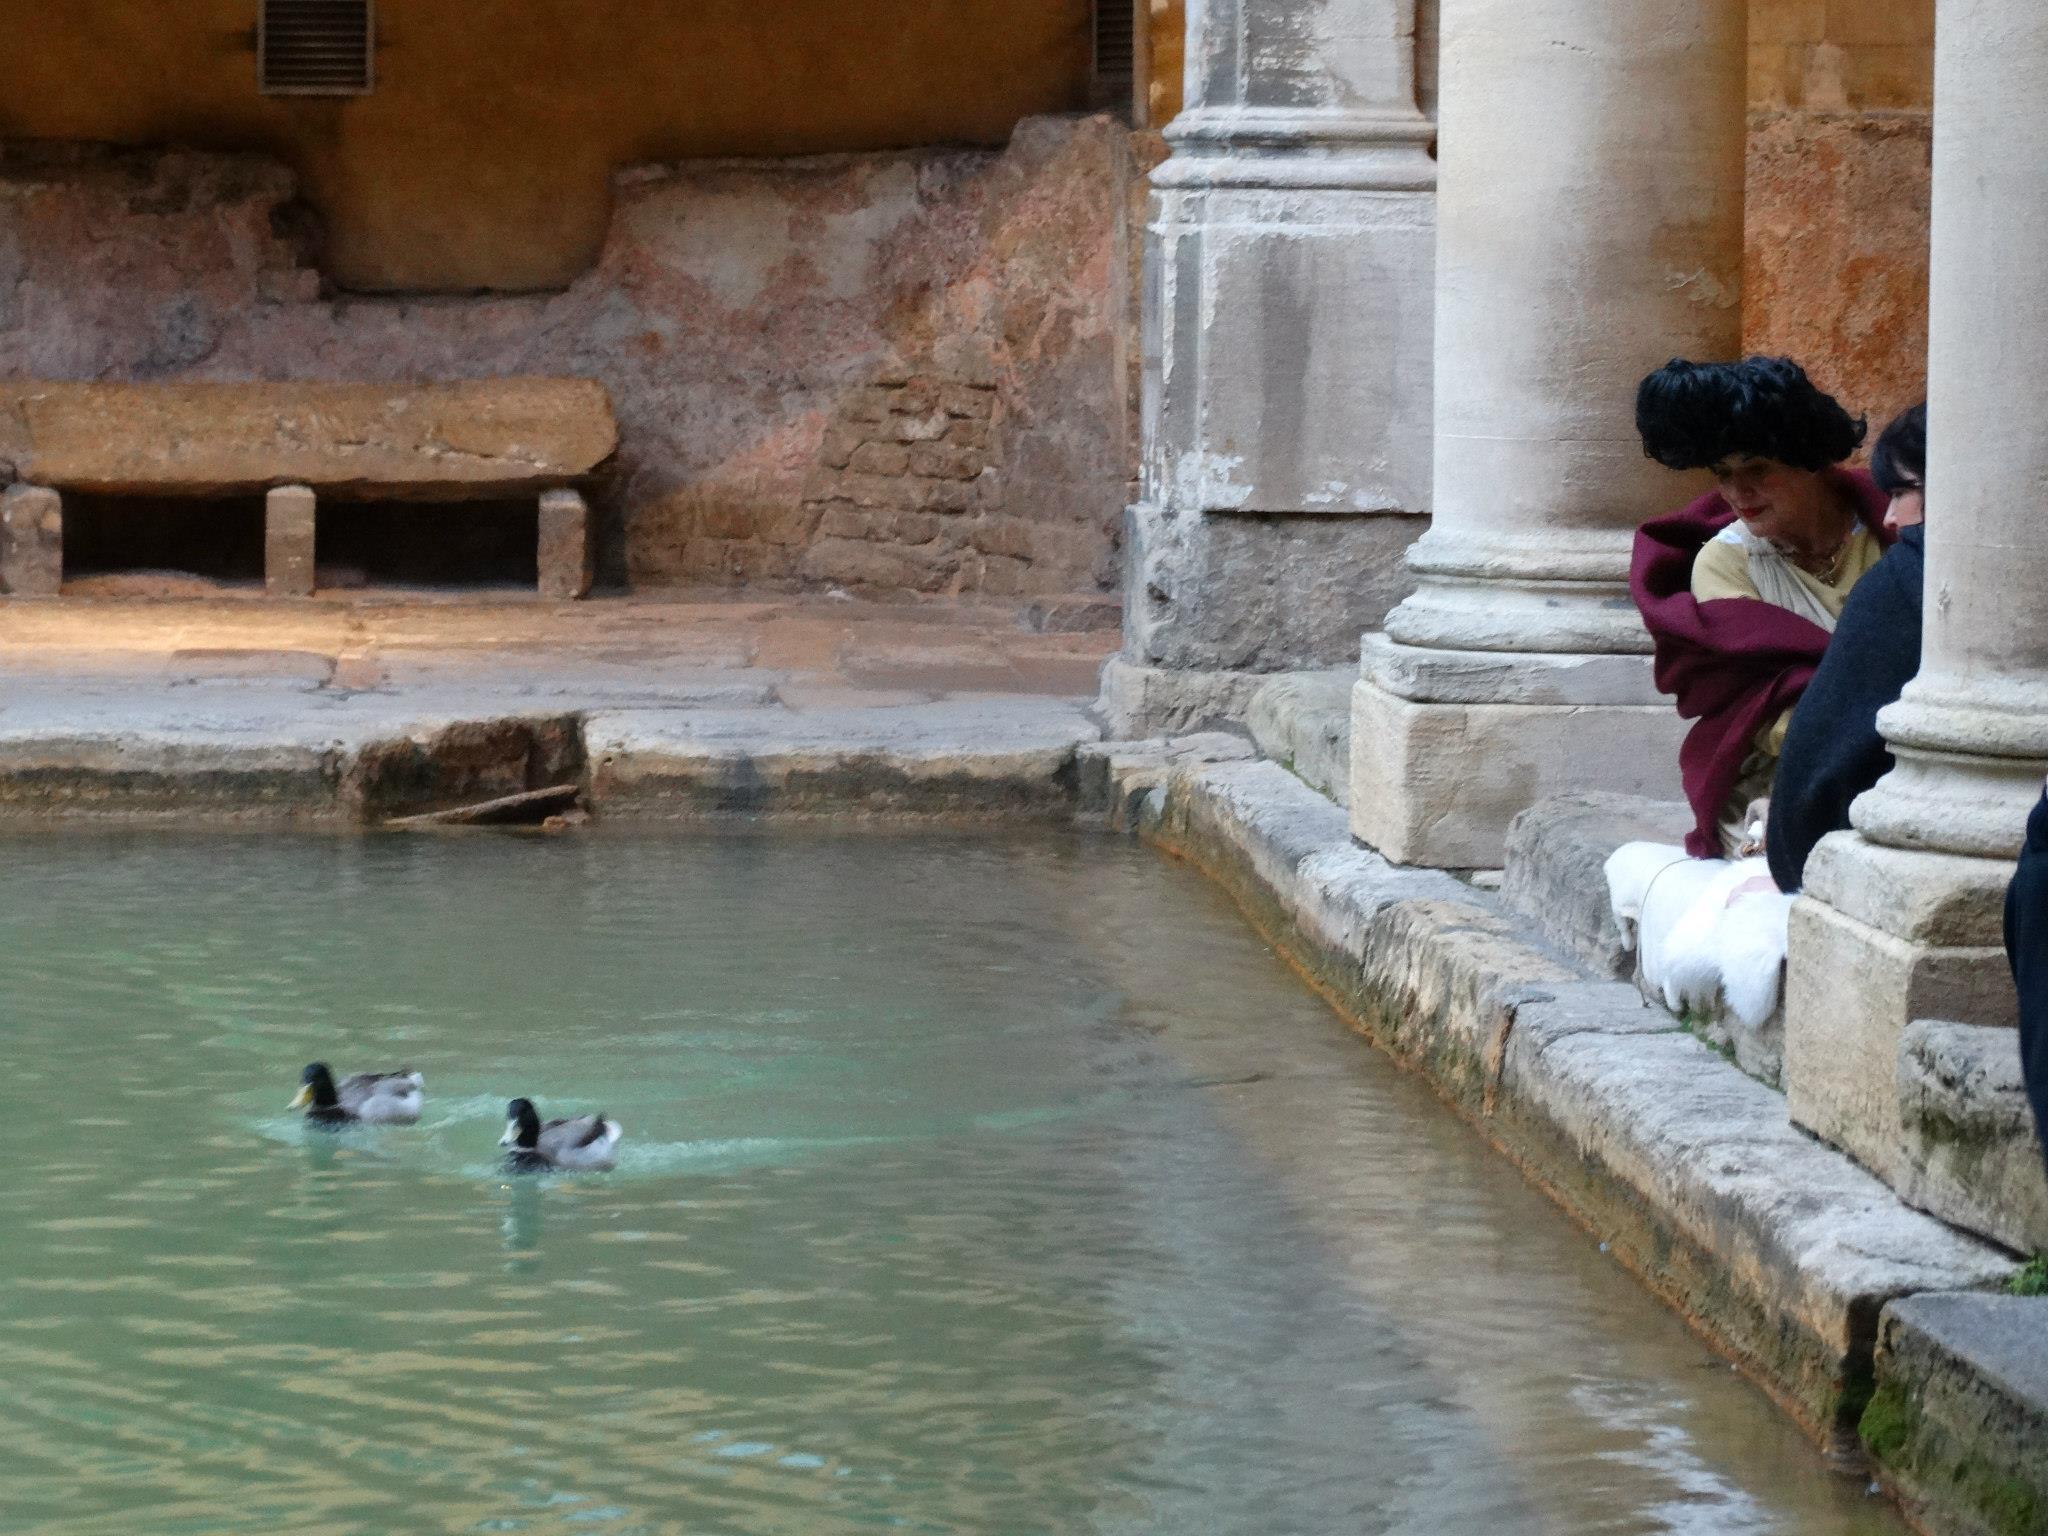 Roman Baths Museum - Bath